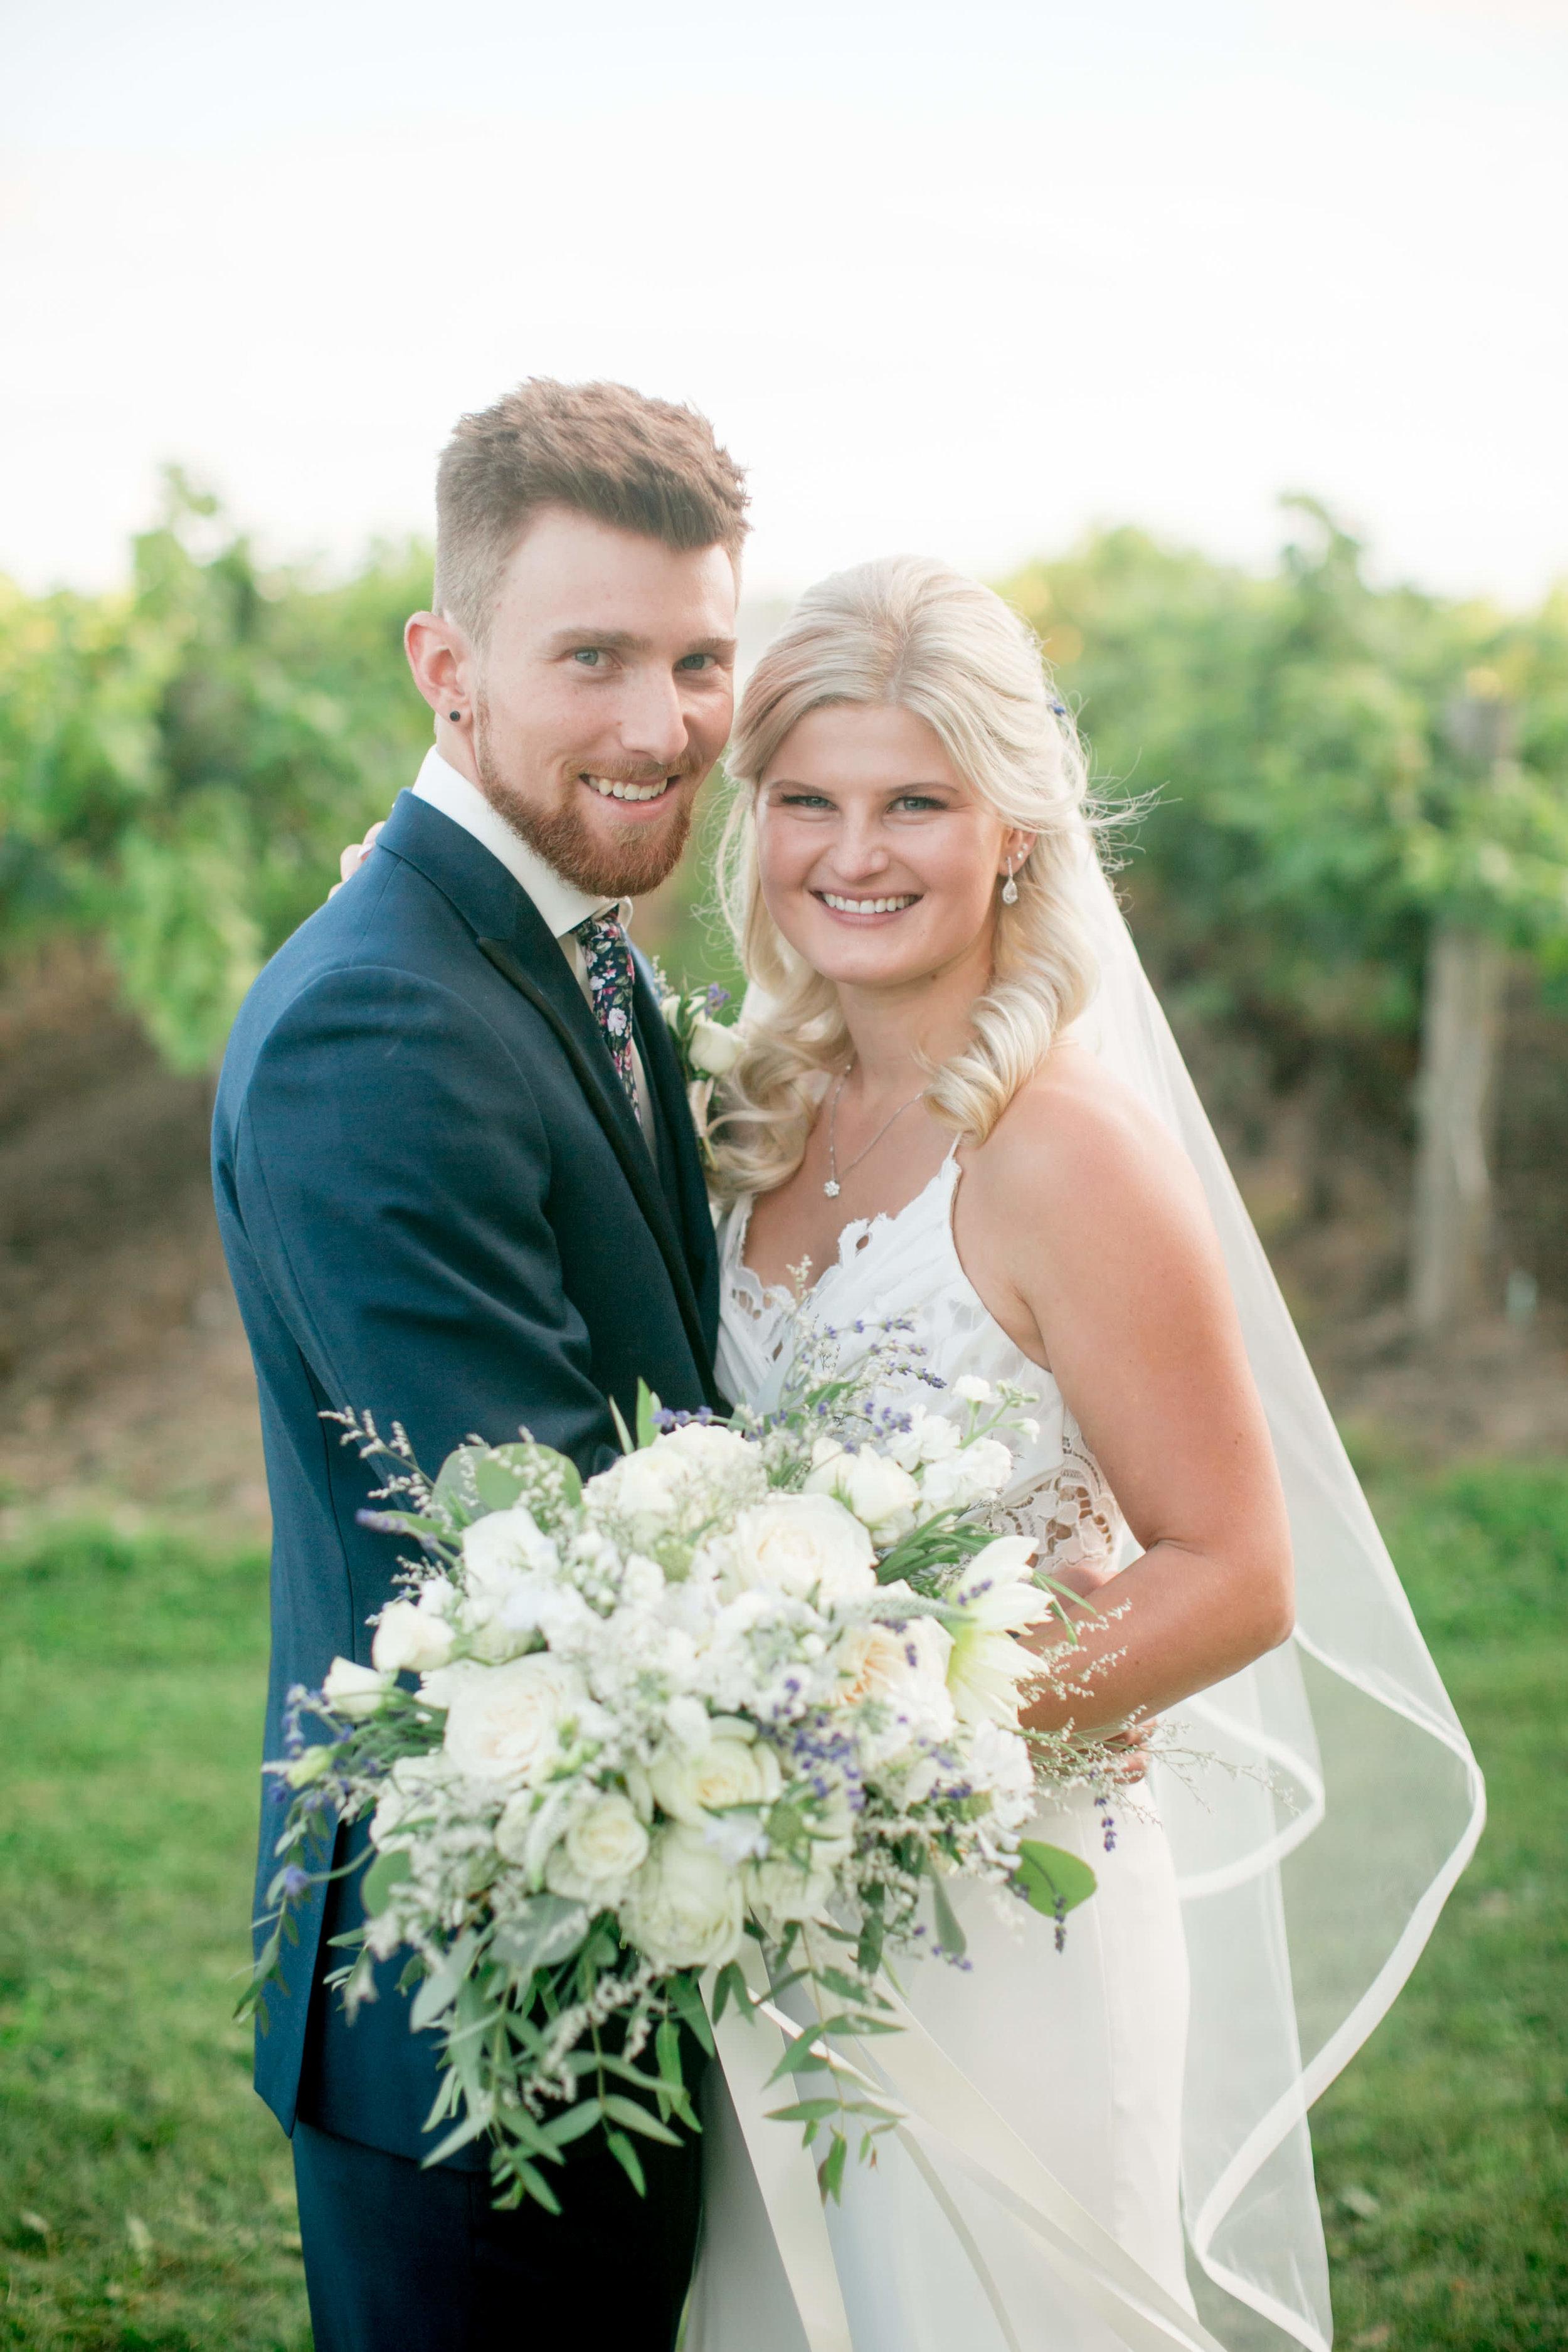 Maddy___Brandon___Daniel_Ricci_Weddings_High_Res._Finals_446.jpg